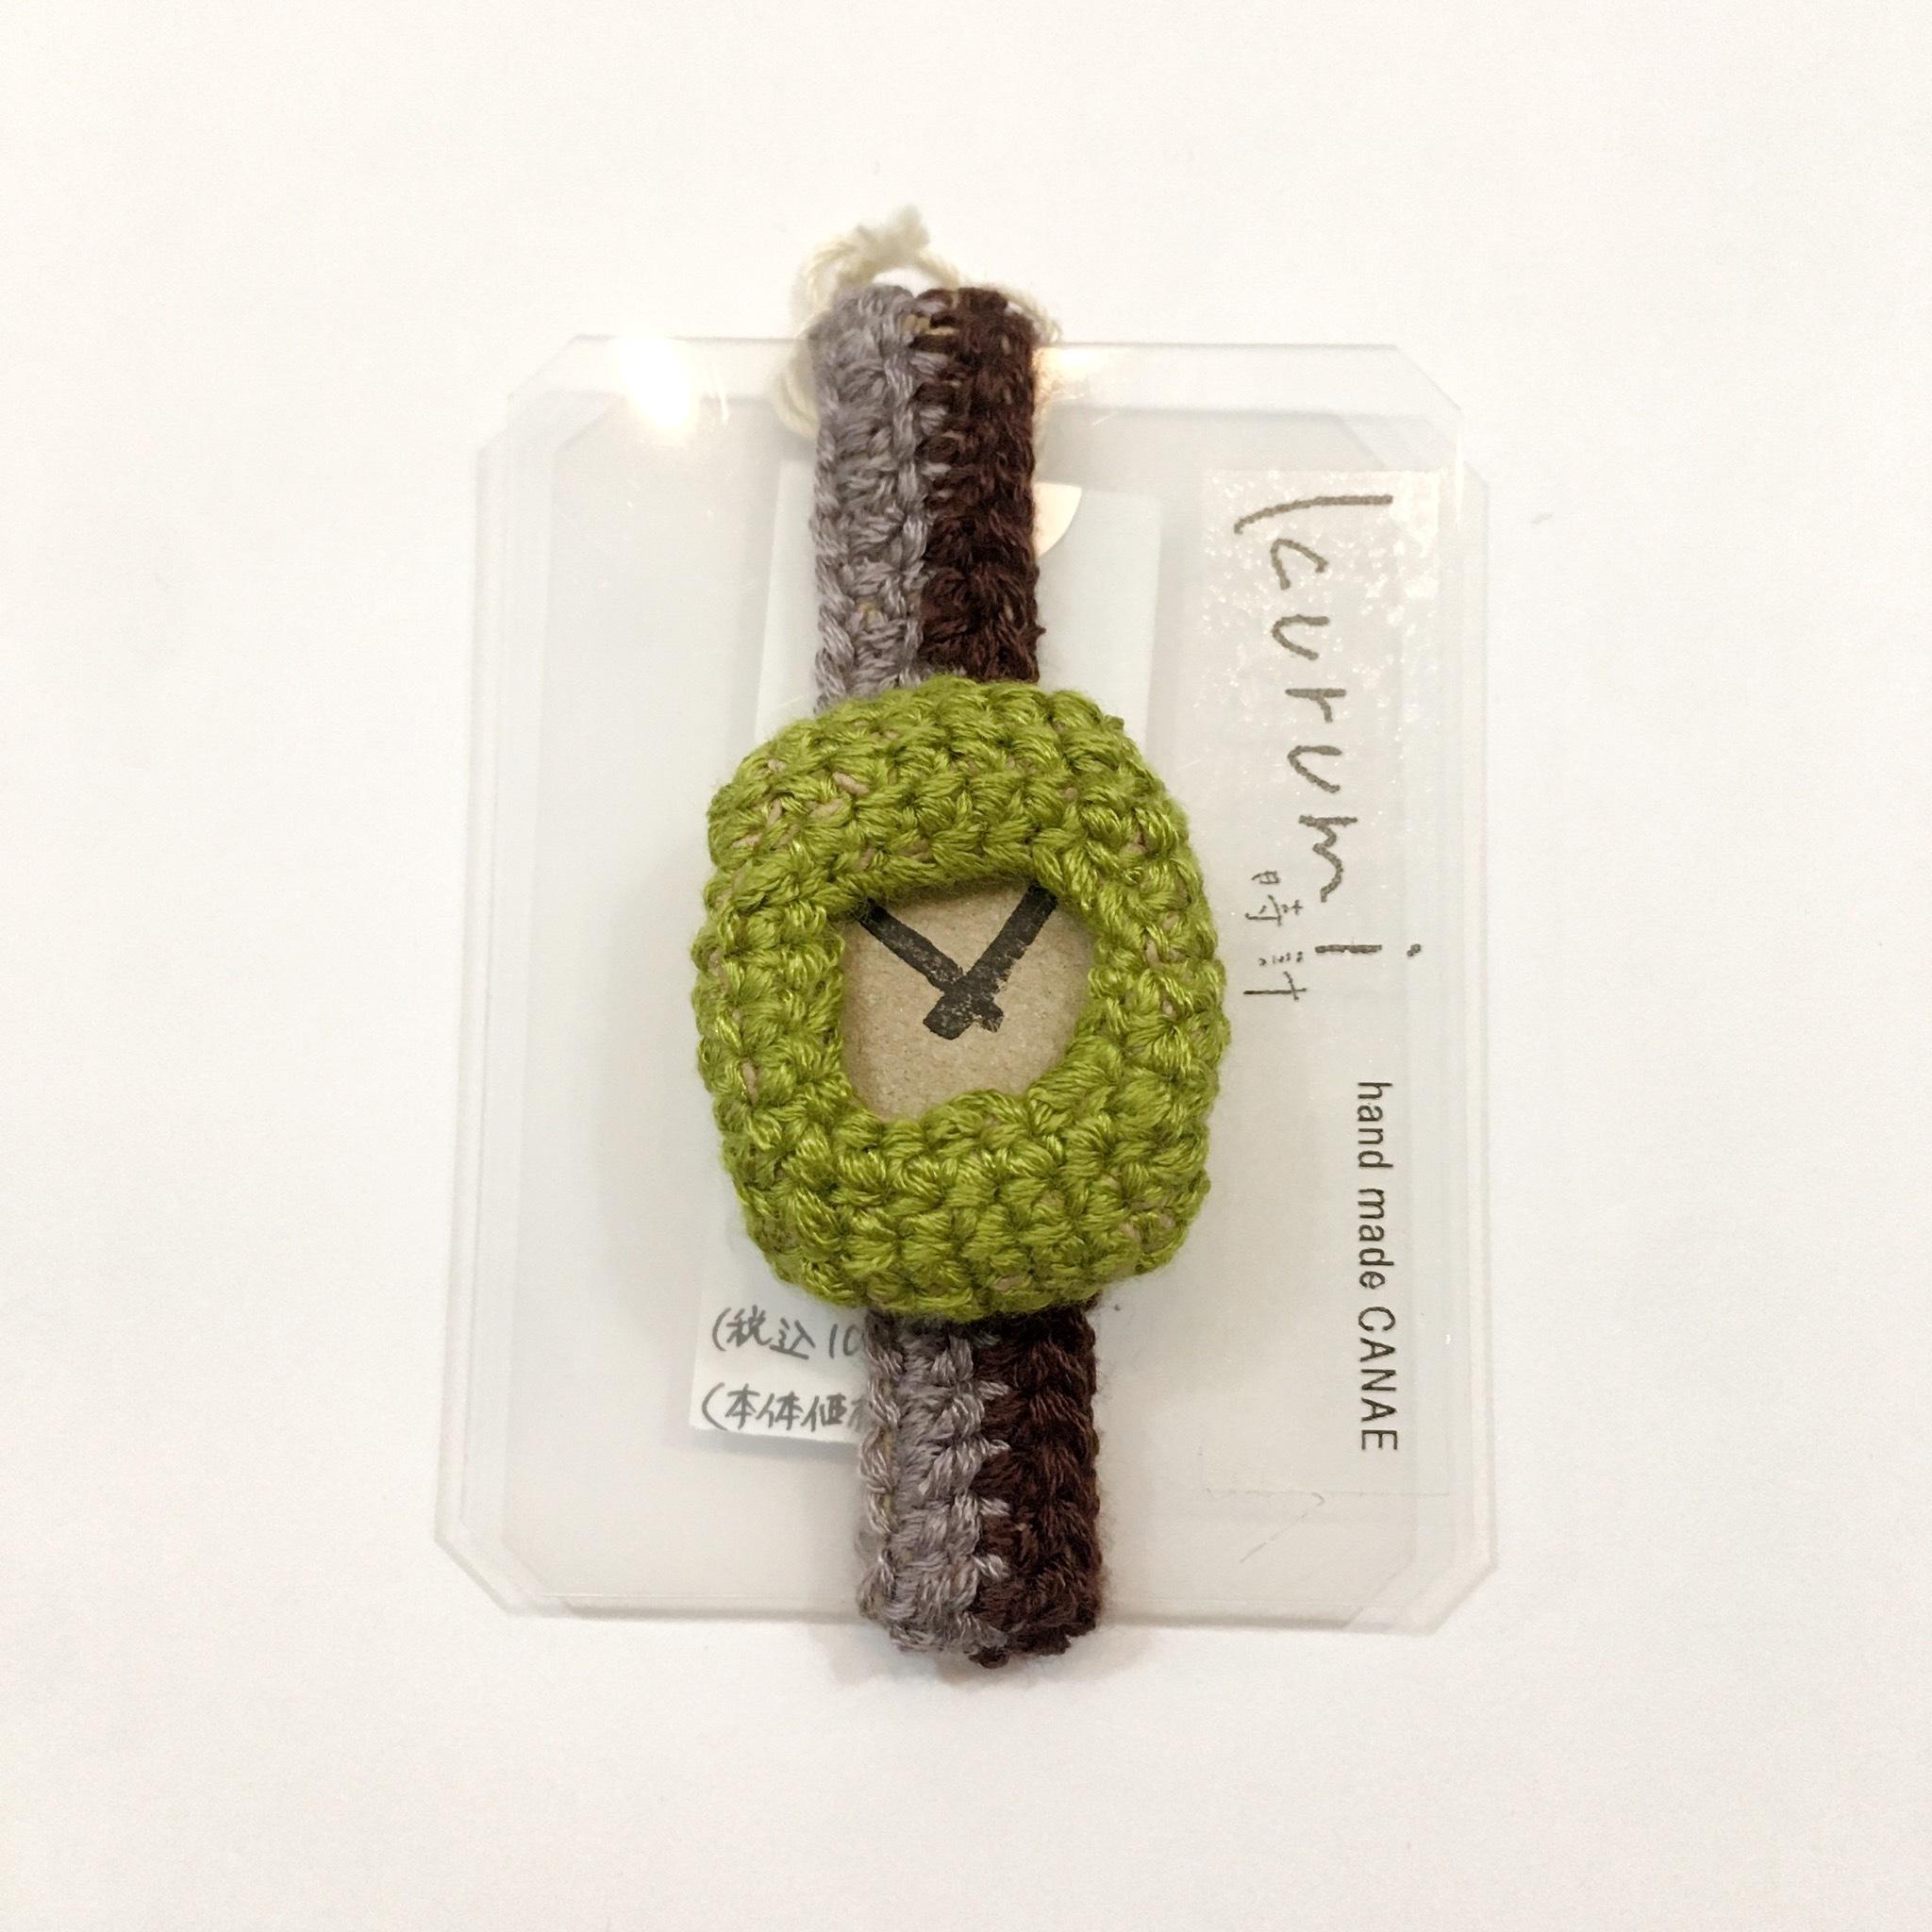 【handmadeCANAE】kurumi時計 替えベルト(小)Lサイズ